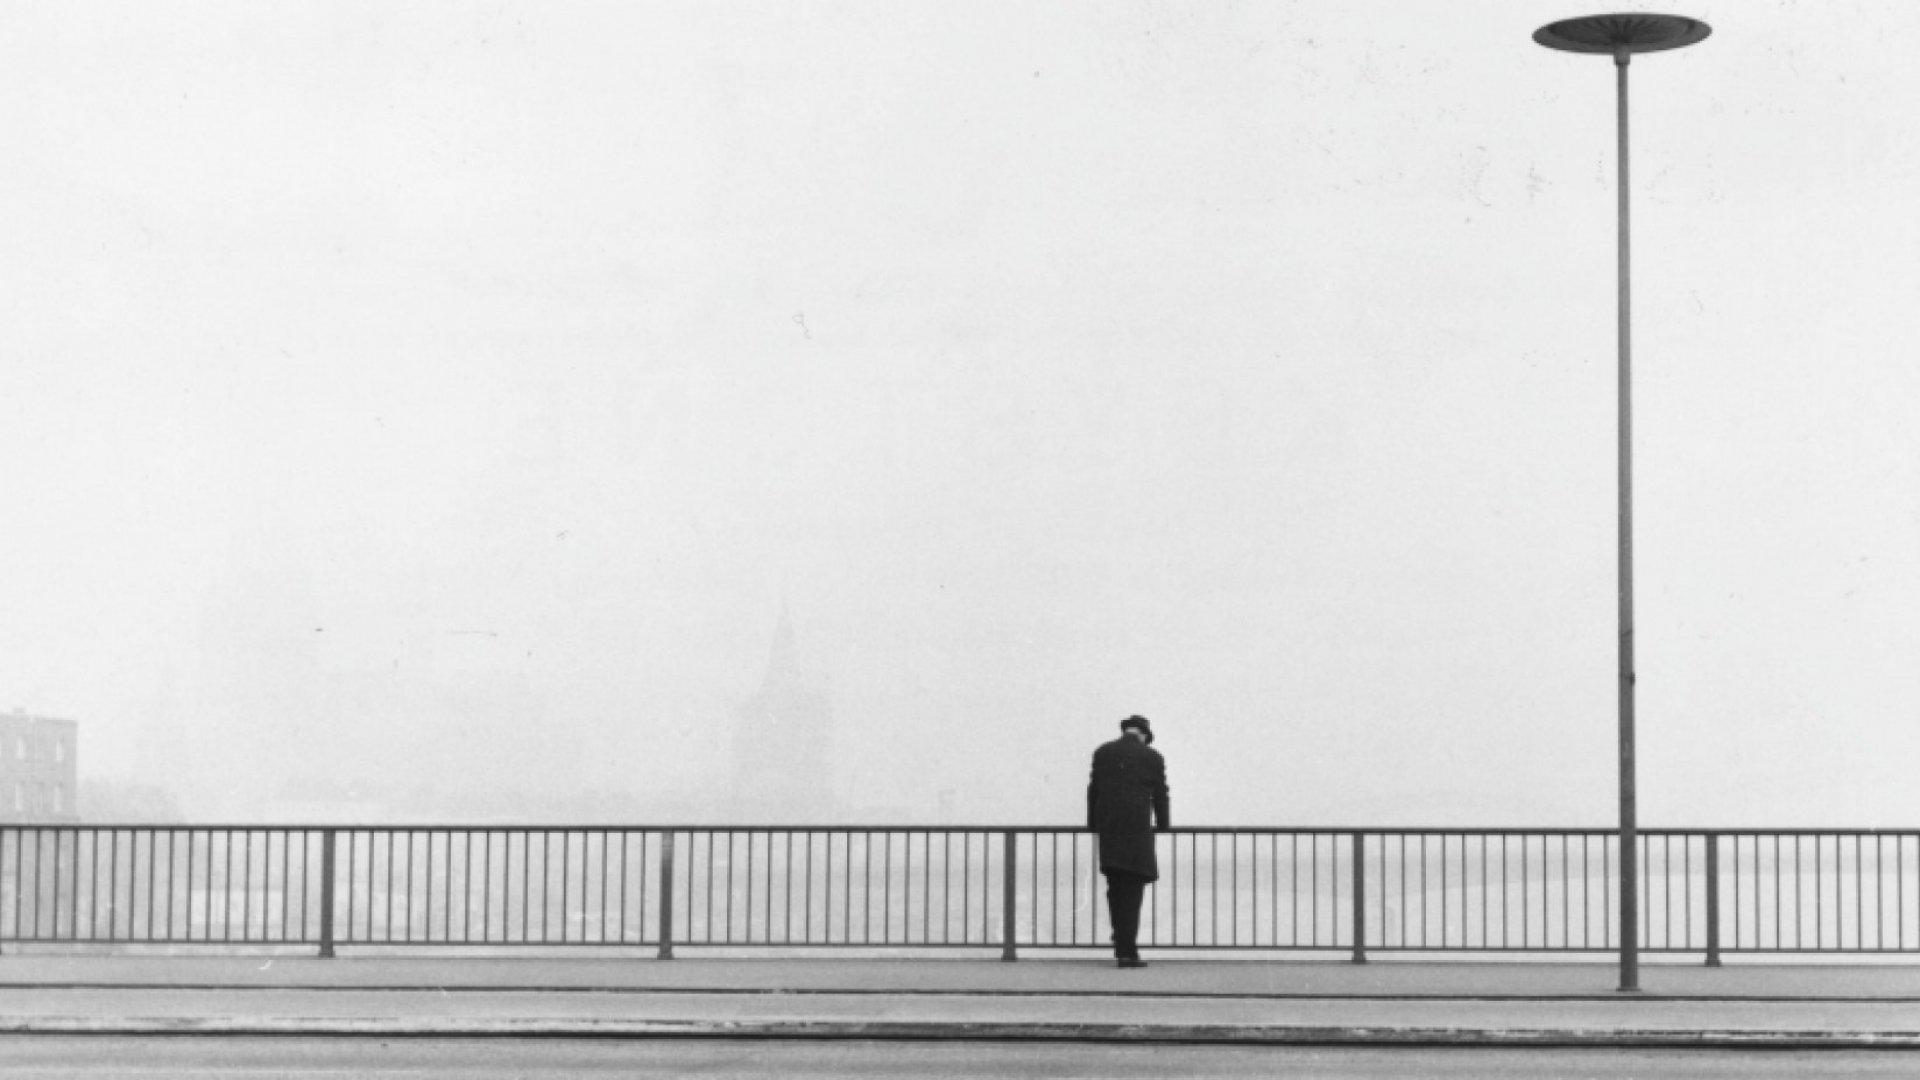 Stillness, Solitude, and Success